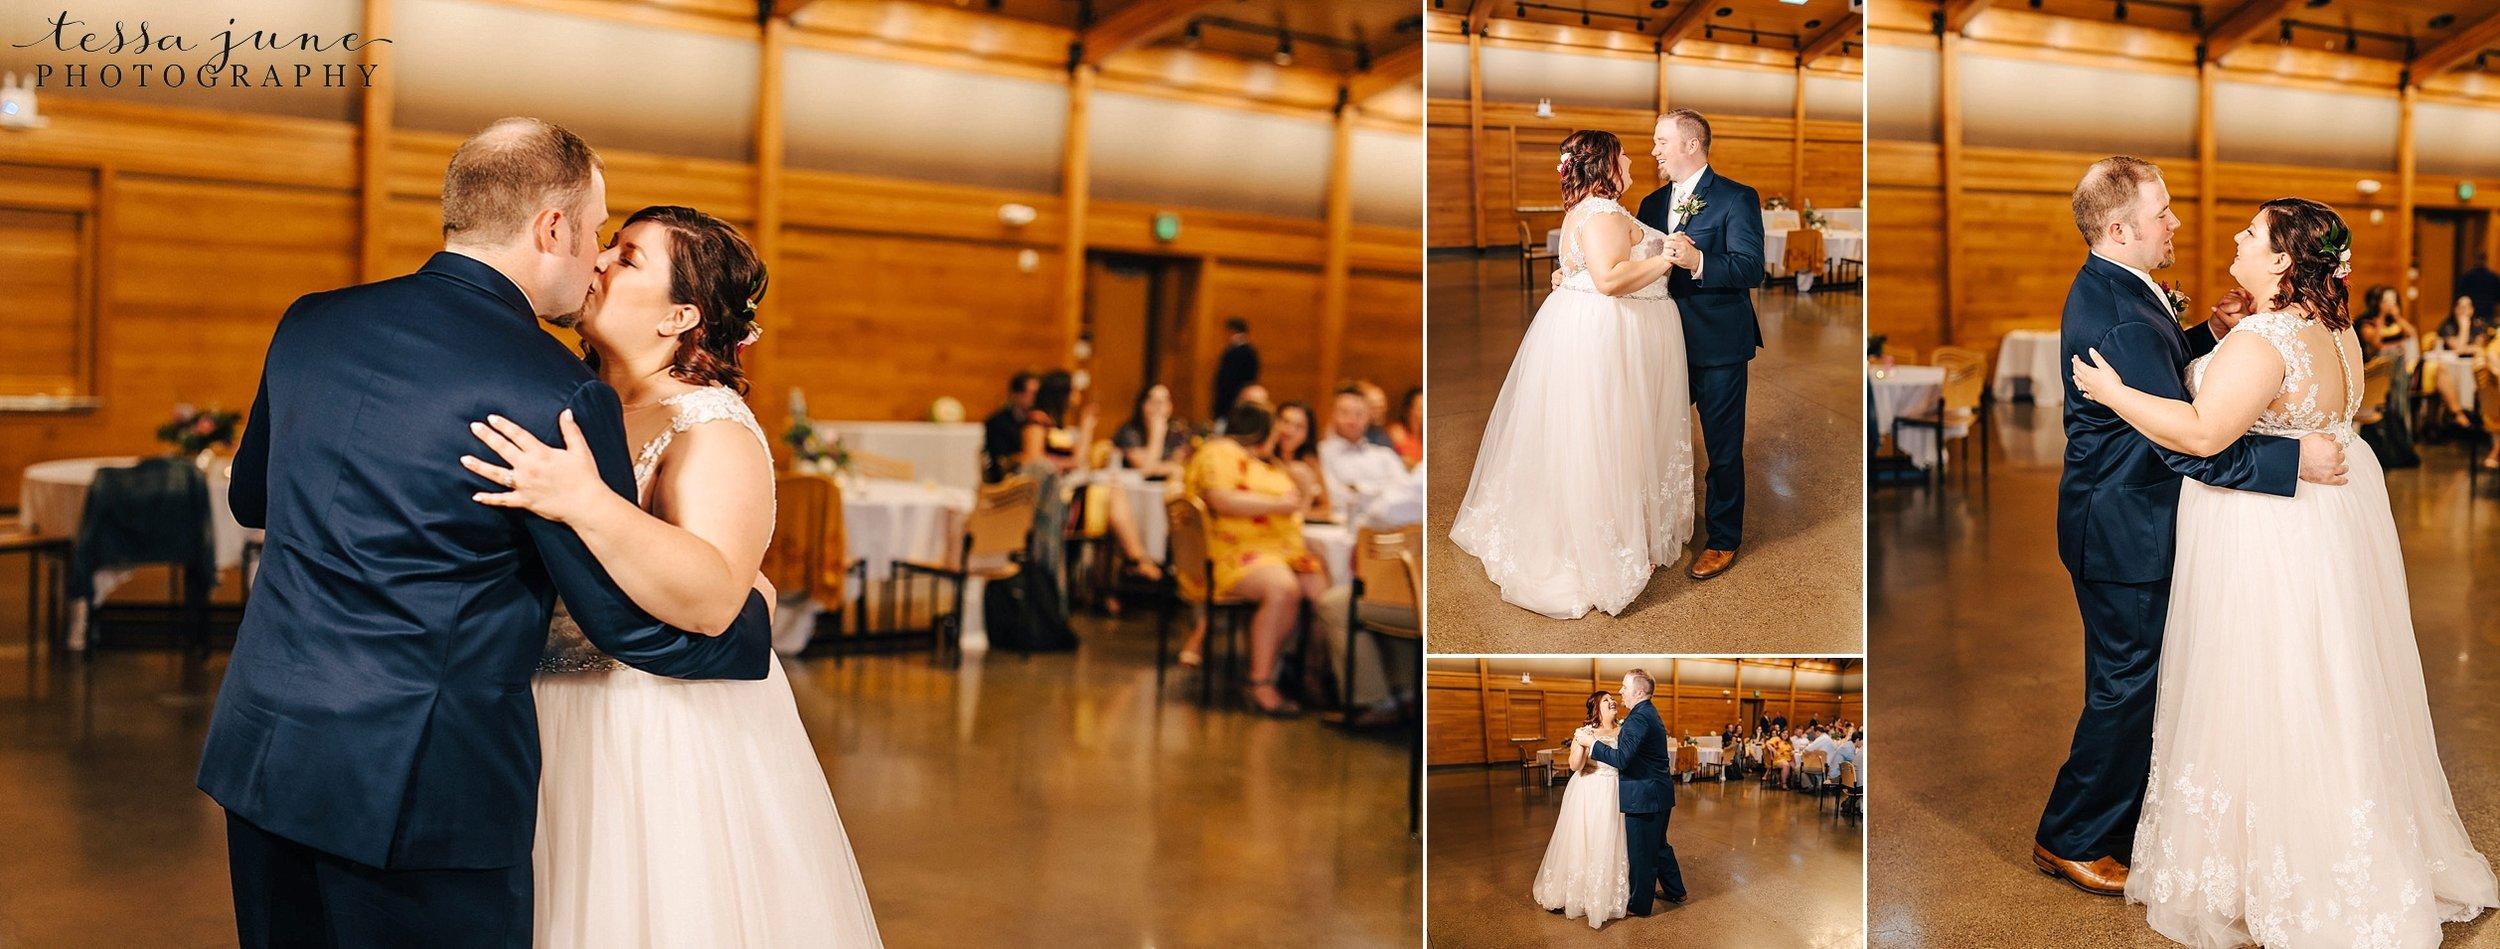 minneapolis-summer-wedding-at-silverwood-park-pristine-floral-132.jpg